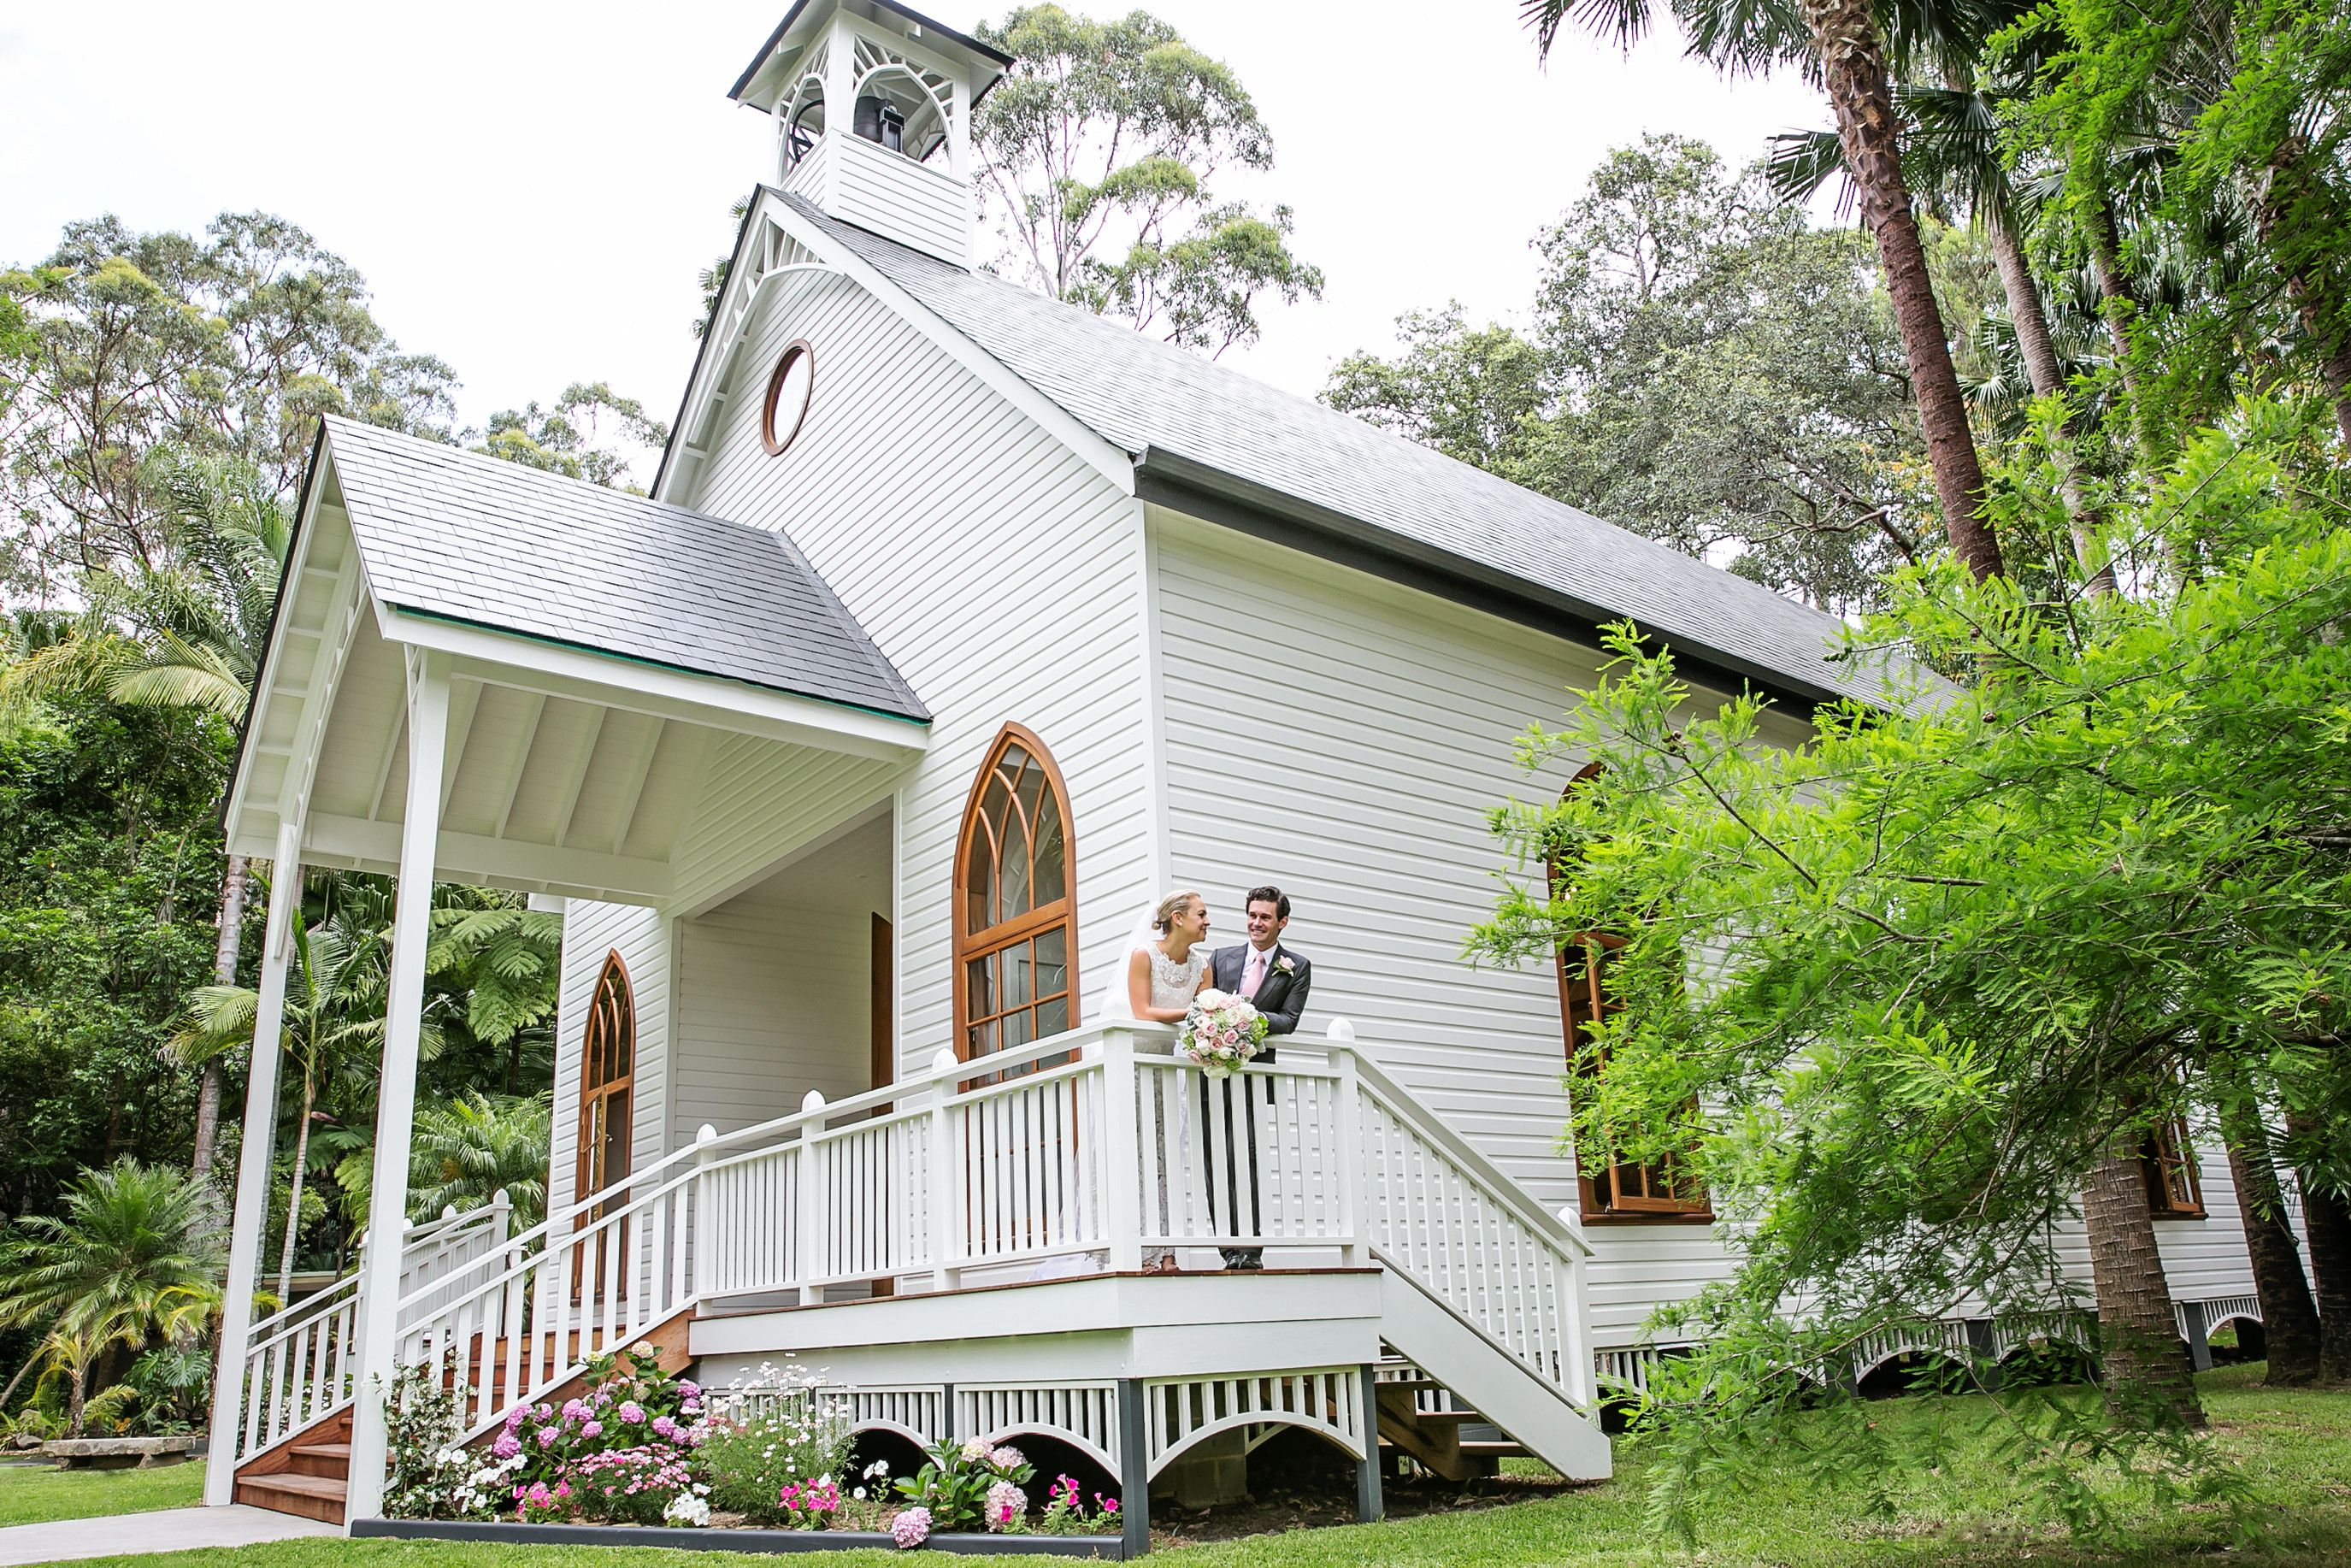 Home to the Charlotte Chapel Kantara